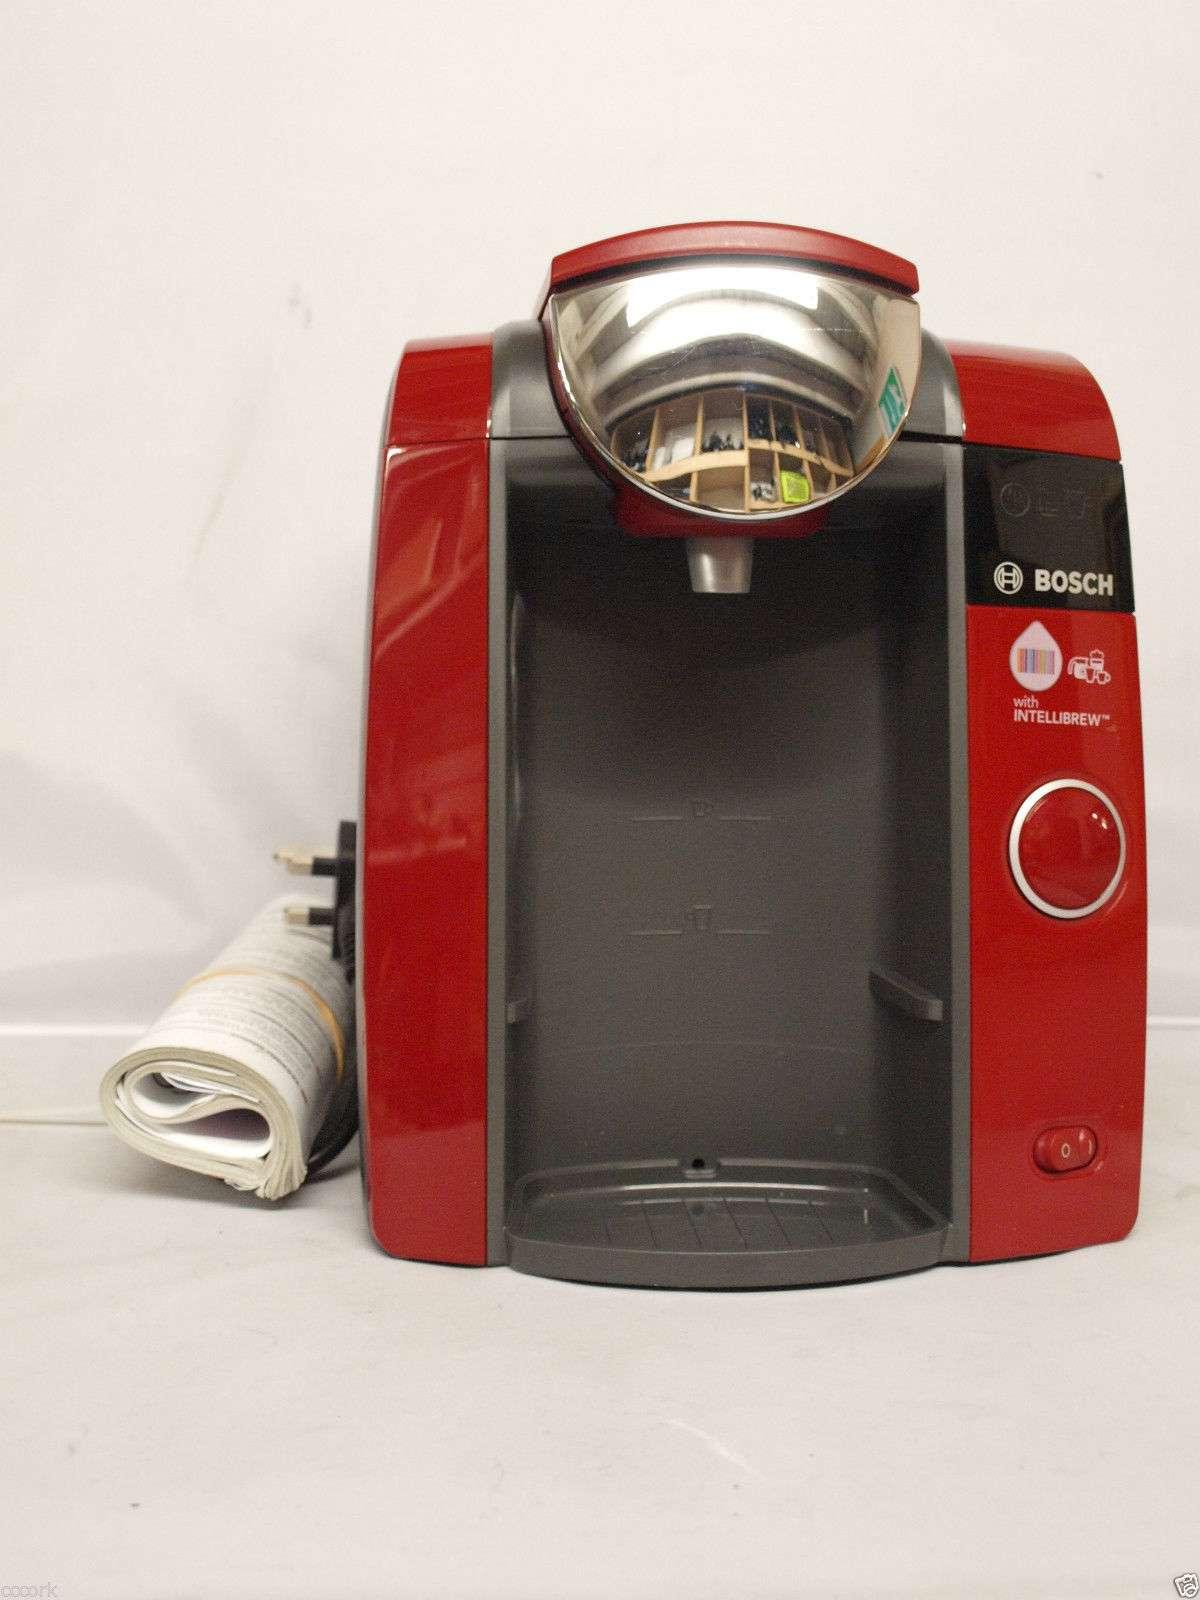 bosch ctpm06 tassimo coffee maker red. Black Bedroom Furniture Sets. Home Design Ideas